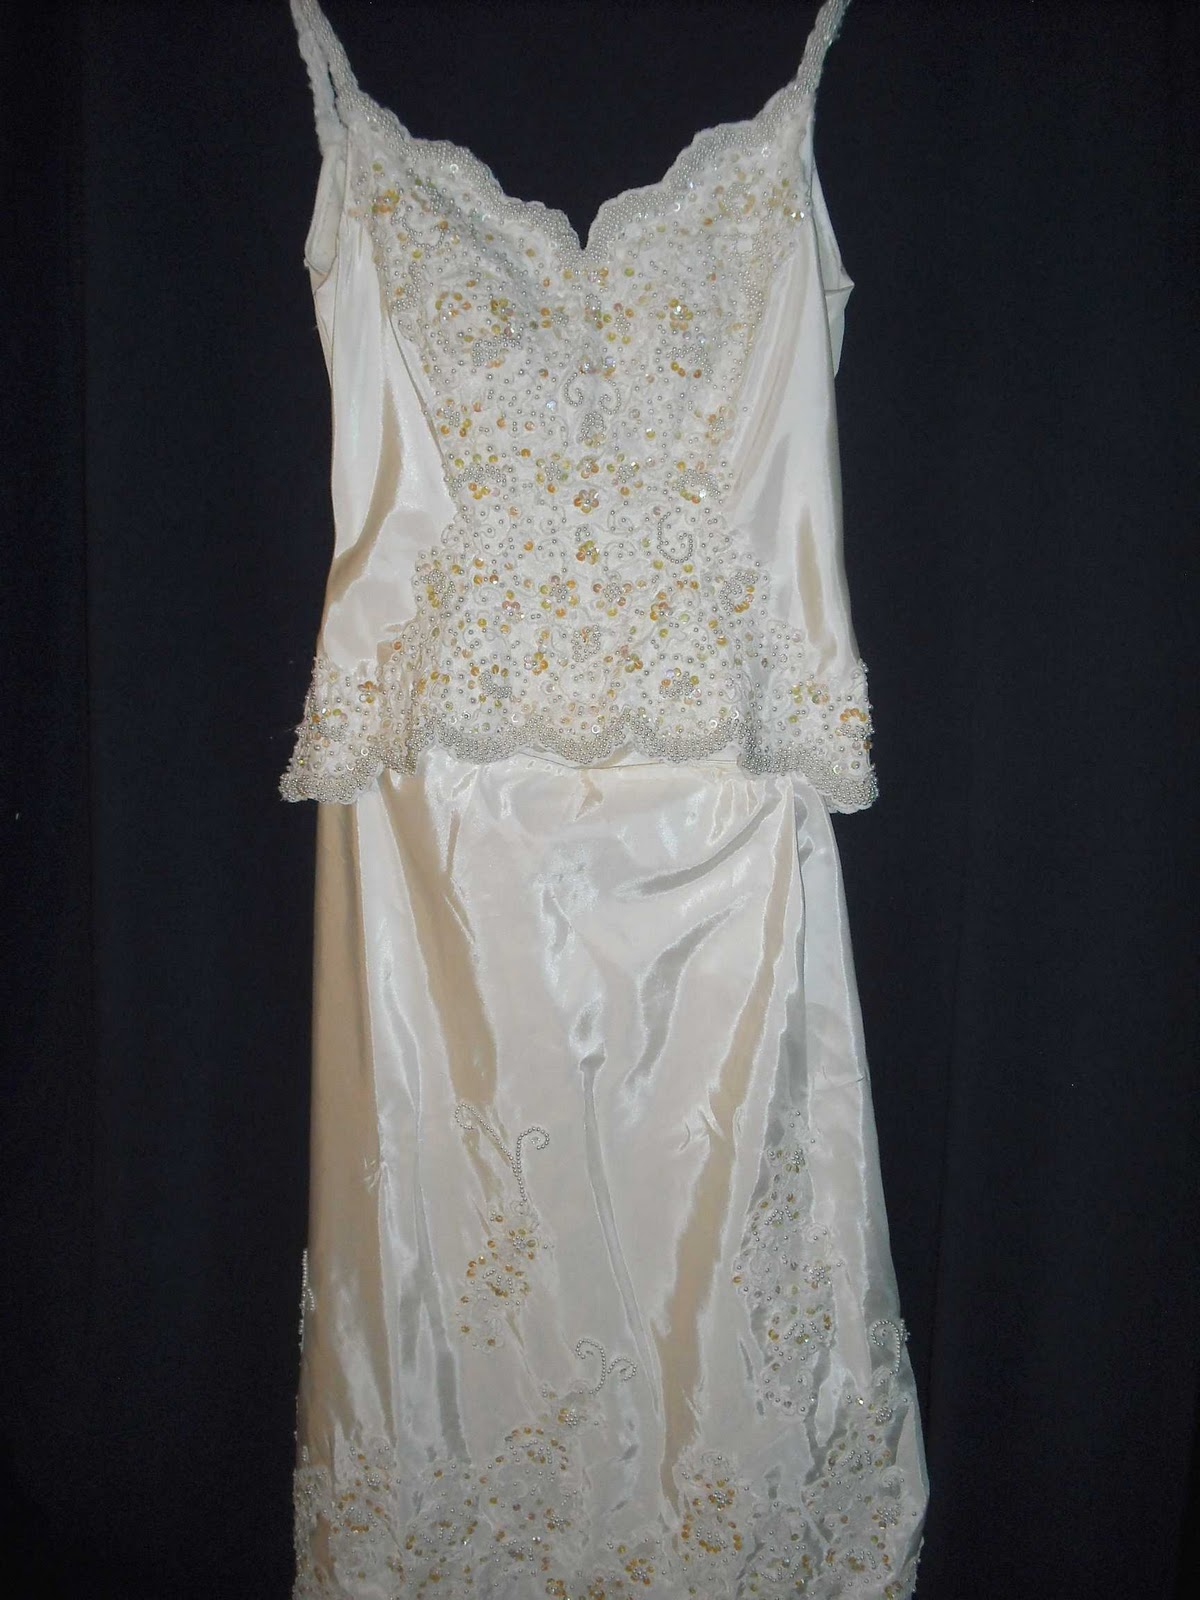 T.C. Chic: My Upcycled Wedding Dress